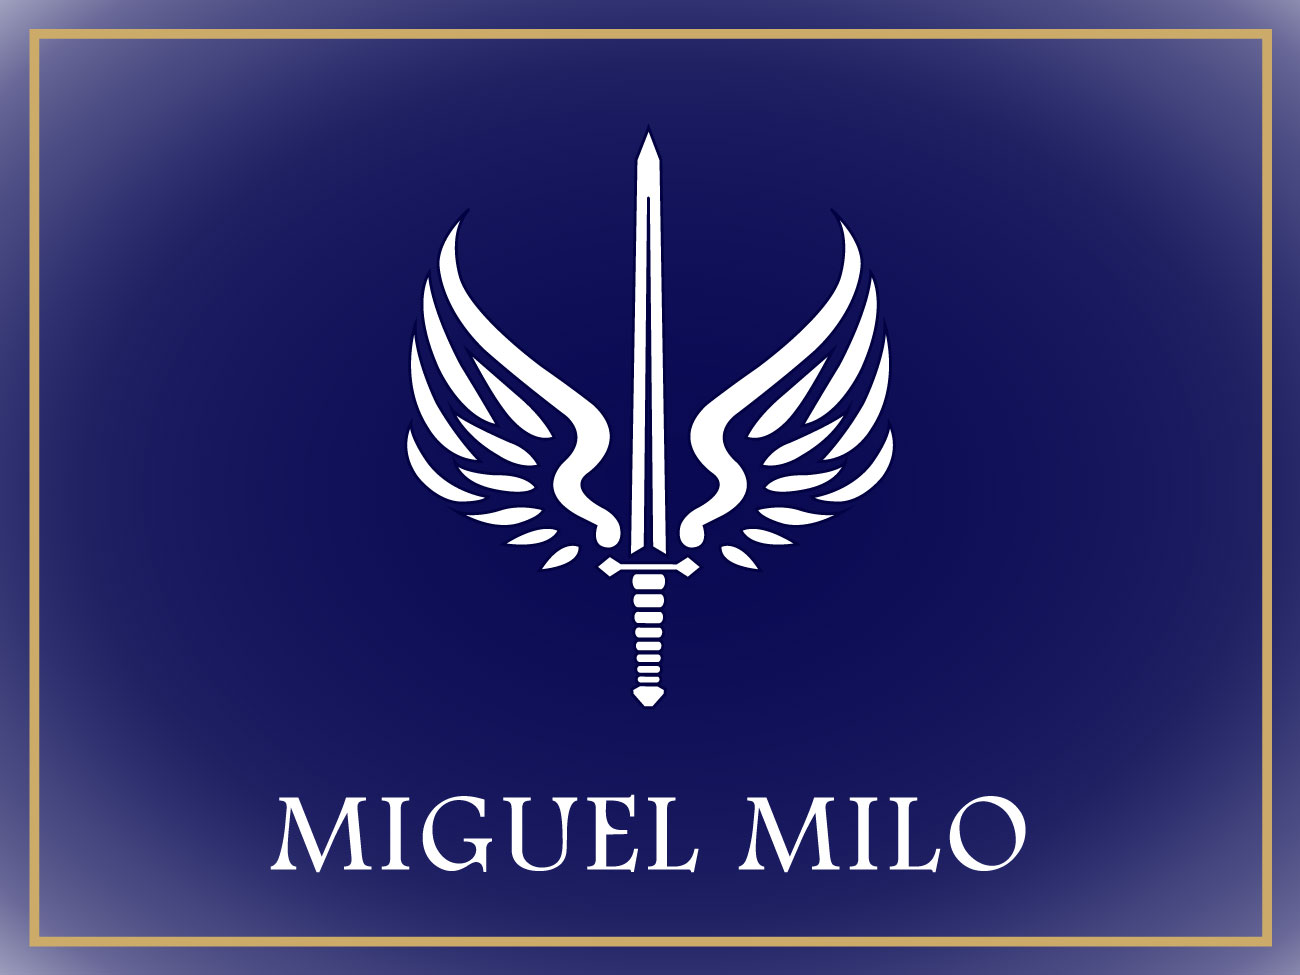 MiguelMilo